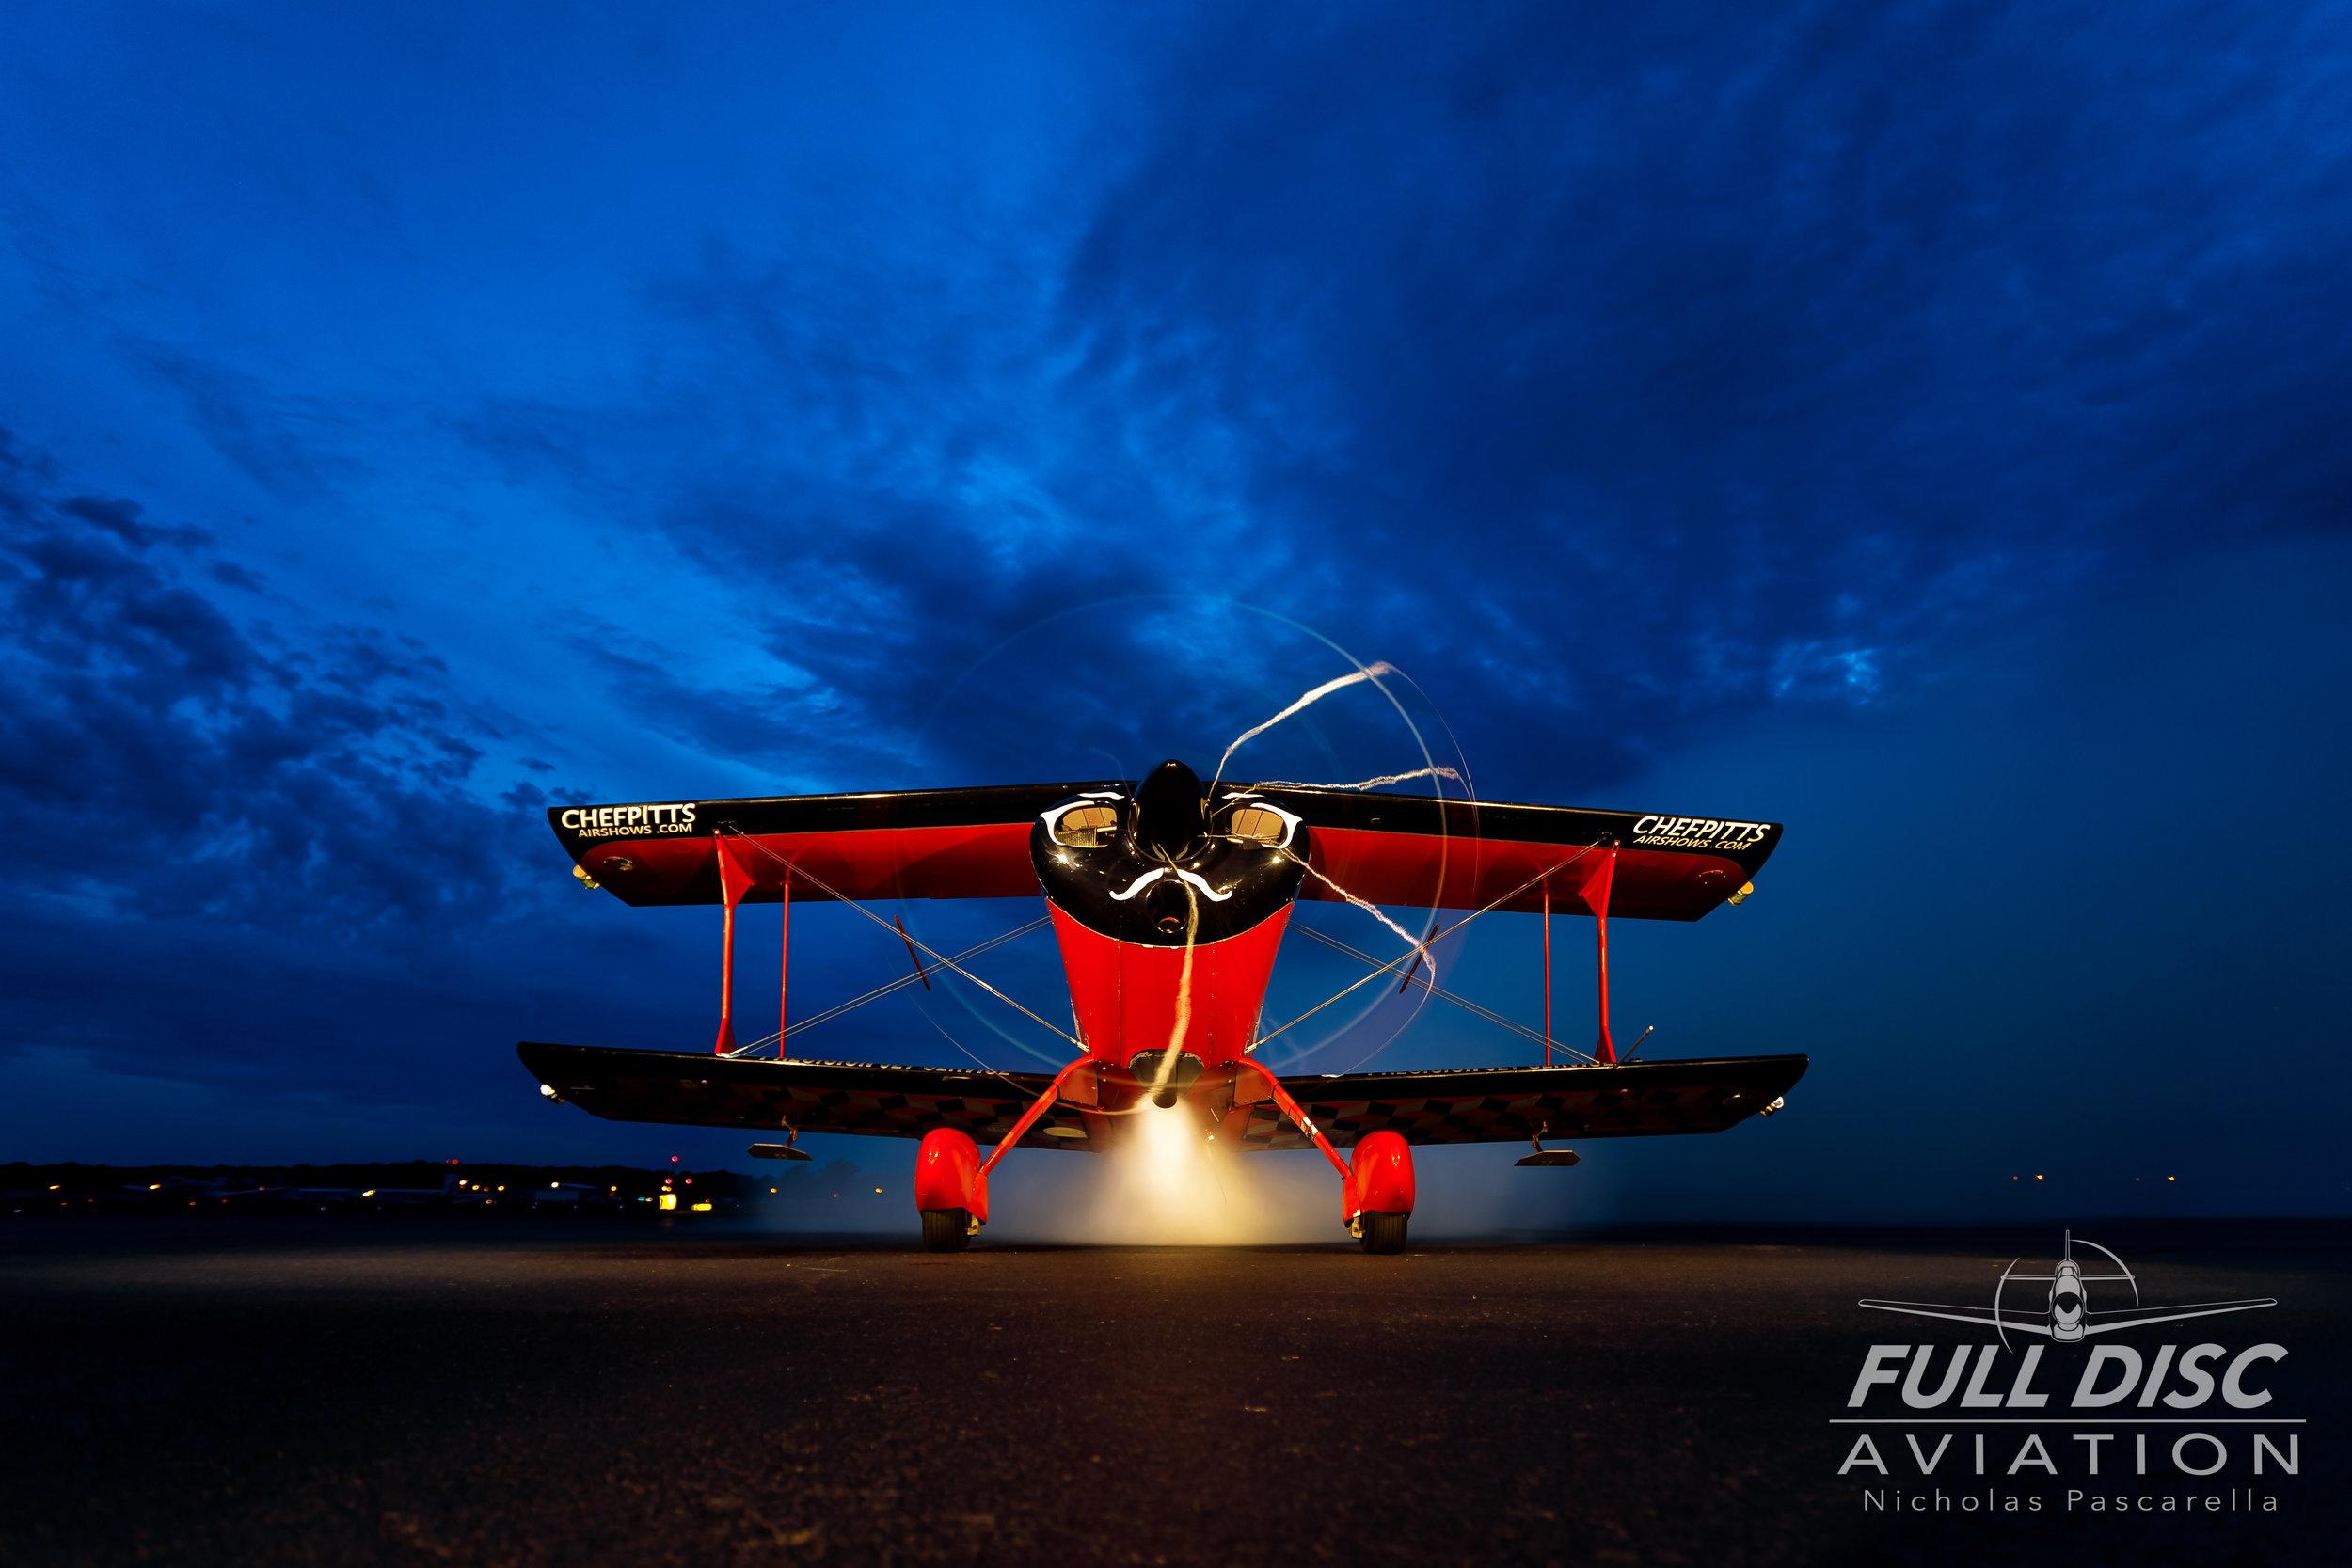 smokin_chefpitts_ rjgritter_decathalon_pilot_portrait_nightshoot__aviation__nickpascarella_nicholaspascarella_fulldiscaviation_leasewebmanassasairshow.jpg.jpg